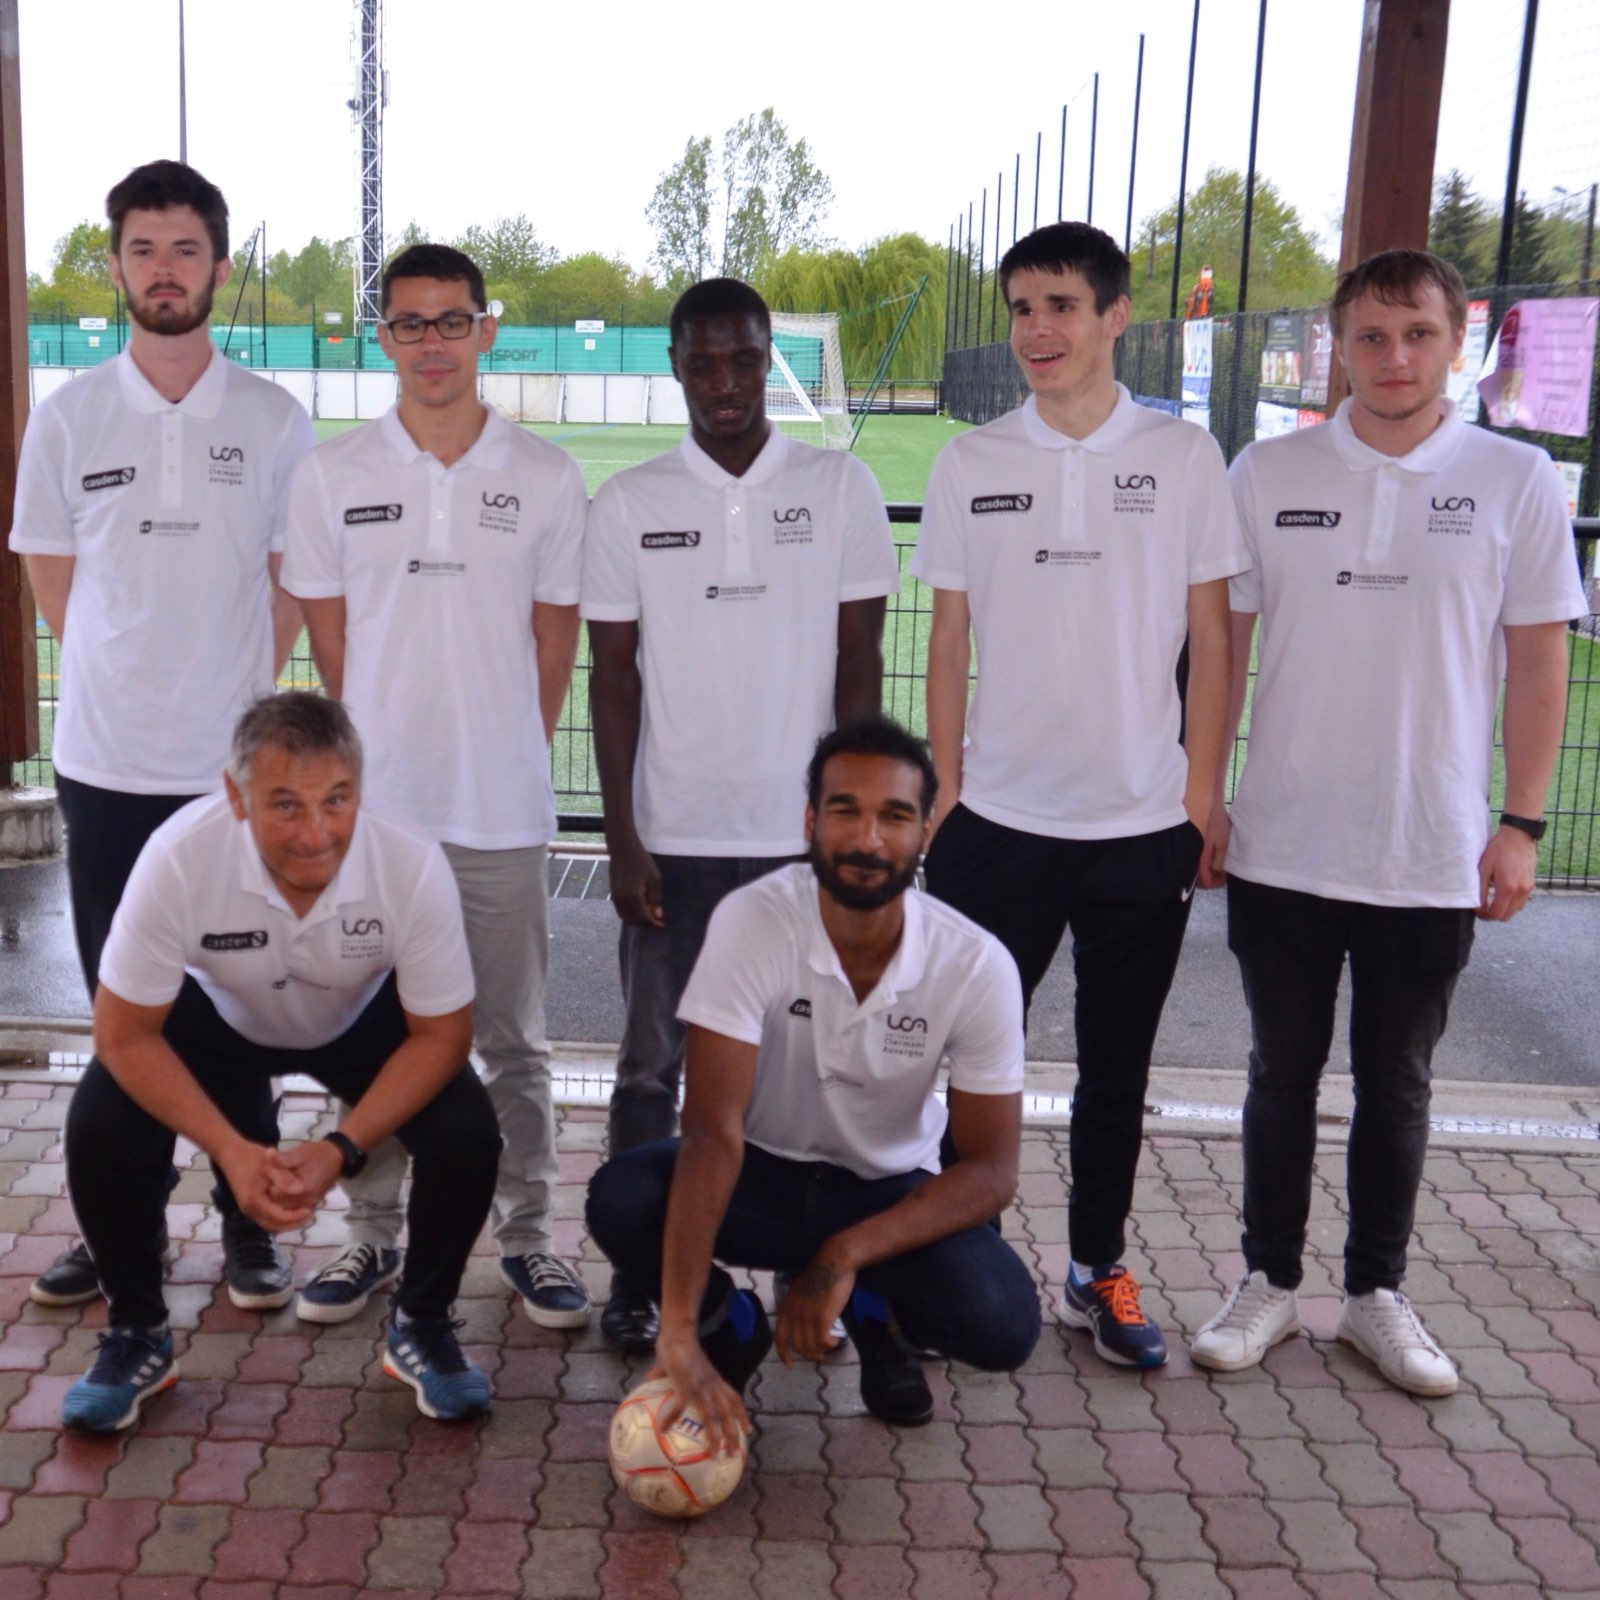 Équipe de cécifoot UCA : Brandan Wittbaard, Paul Moreau, Ousmane Lô, Théo Liffaud, Antoine Bourachot,  Bruno Scherrer (entraîneur), Dilane Dhampattiah